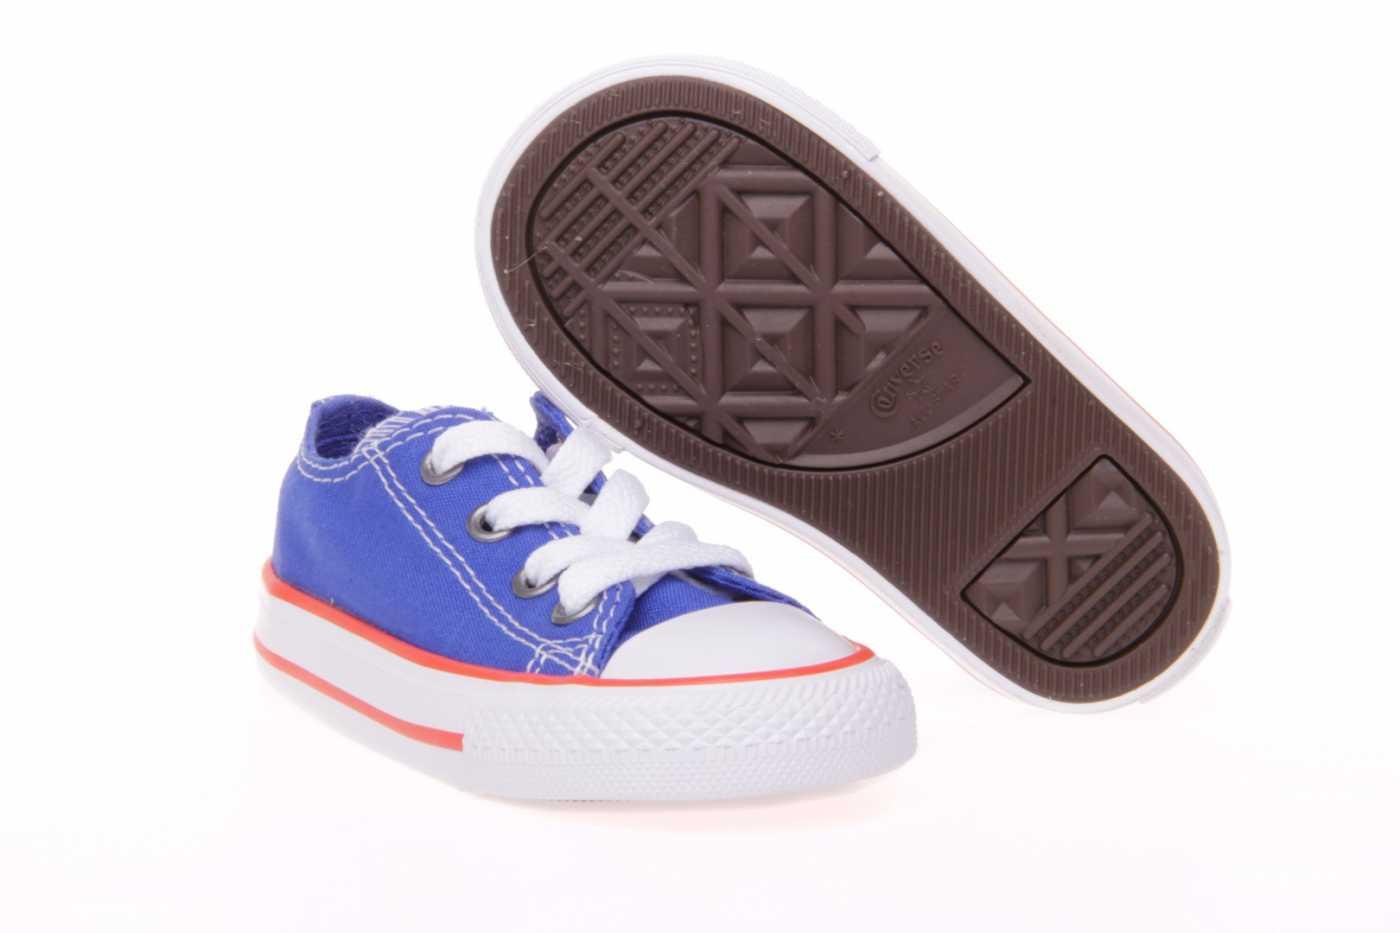 23c64fbdc0a84 Comprar zapato tipo JOVEN NIÑO estilo LONA COLOR AZULON TEXTIL ...